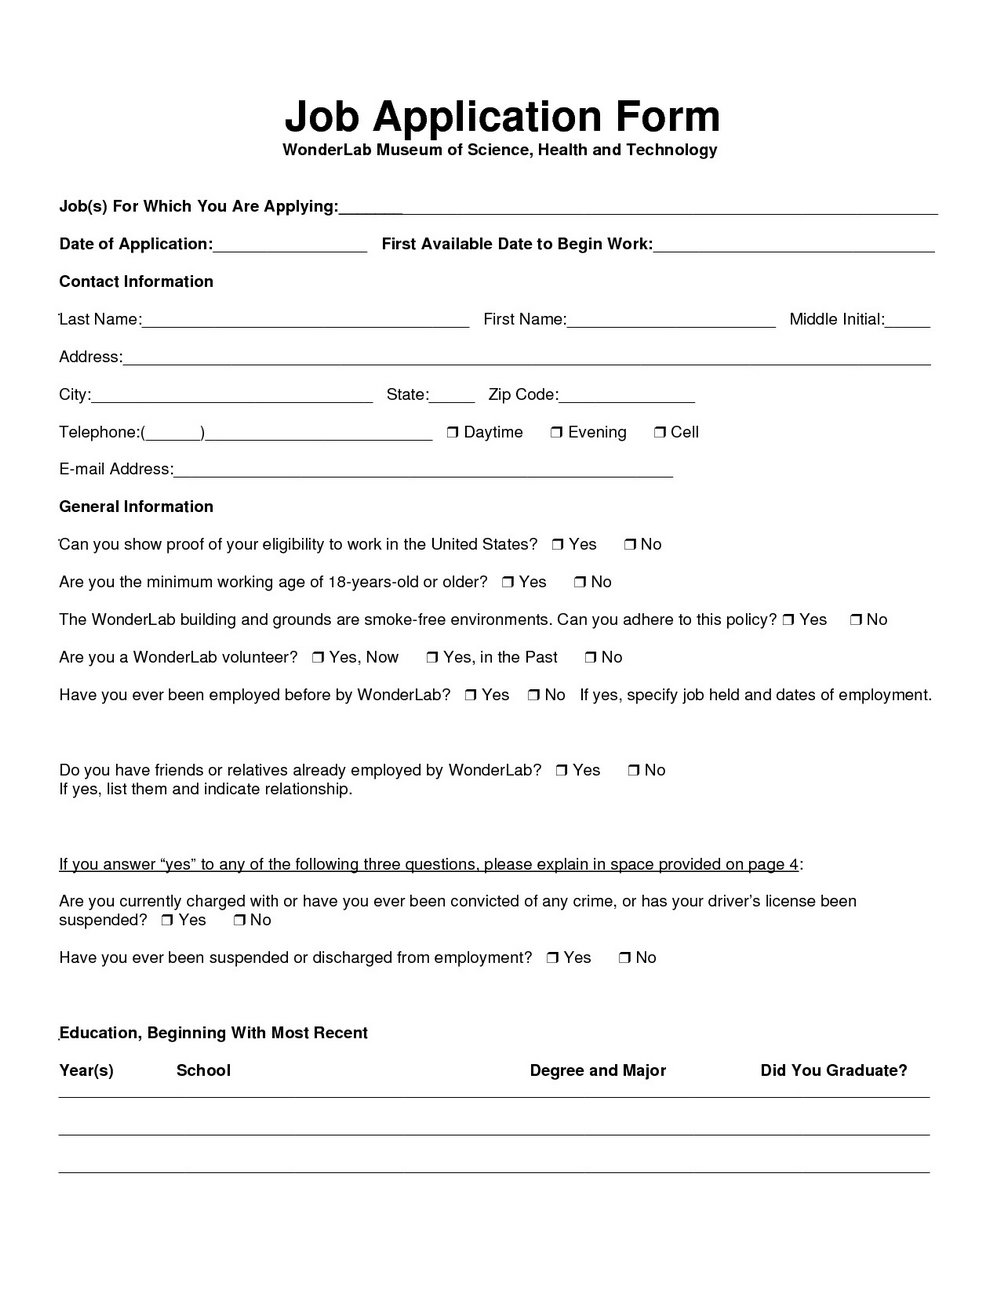 Dollar General Application Form Online